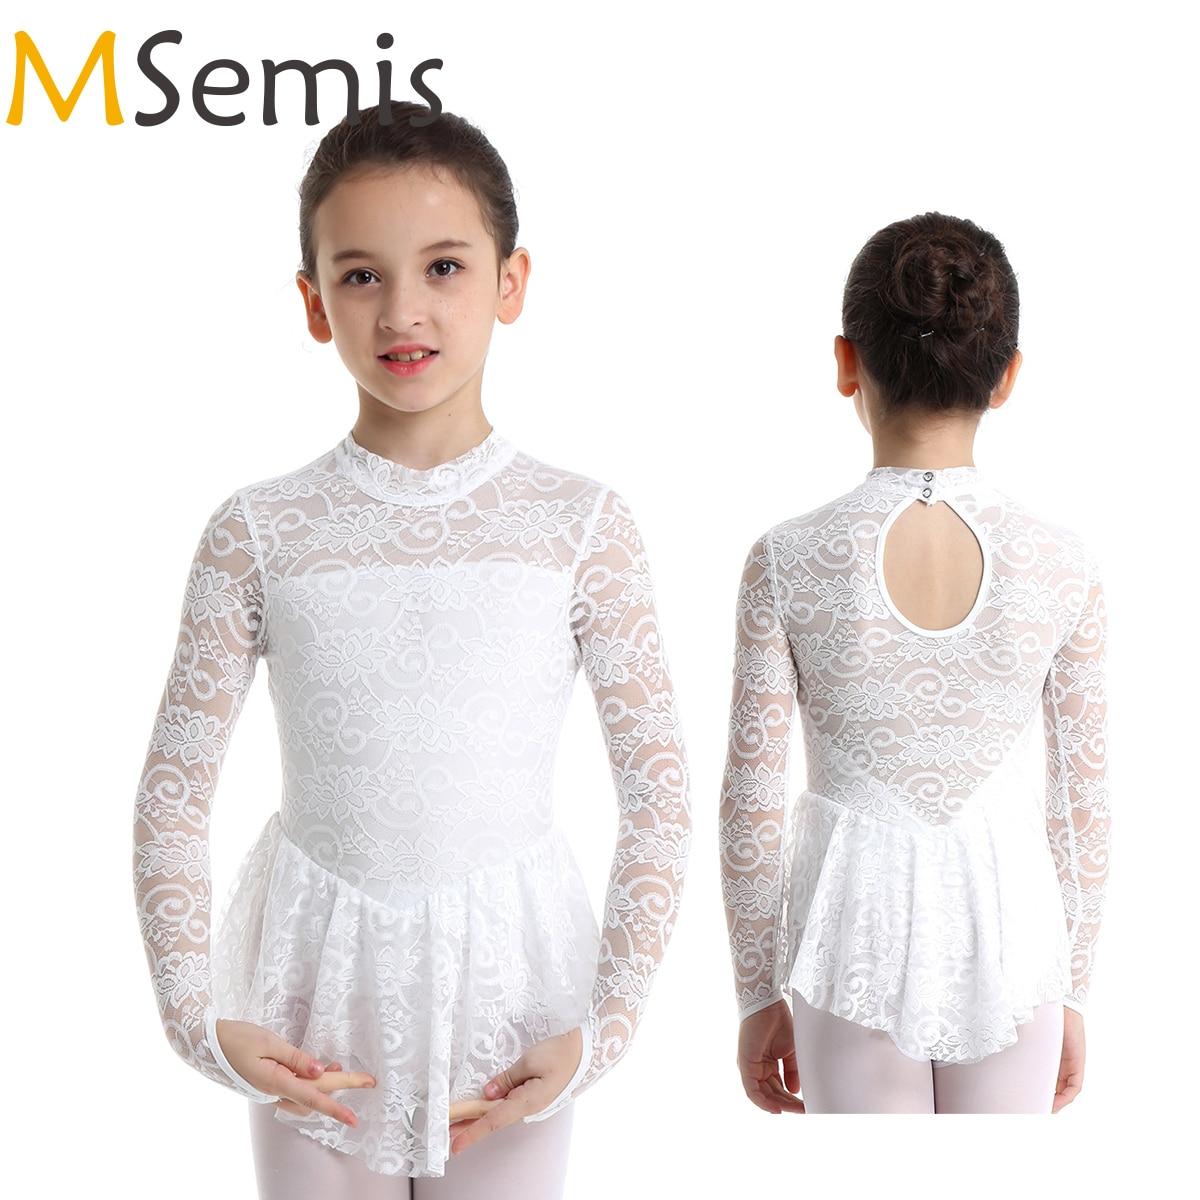 MSemis Kids Girls Figure Ice Skating Dress Floral Lace Ballet Tutu Dress Gymnastics Leotard Ballroom Competition Dance Costume